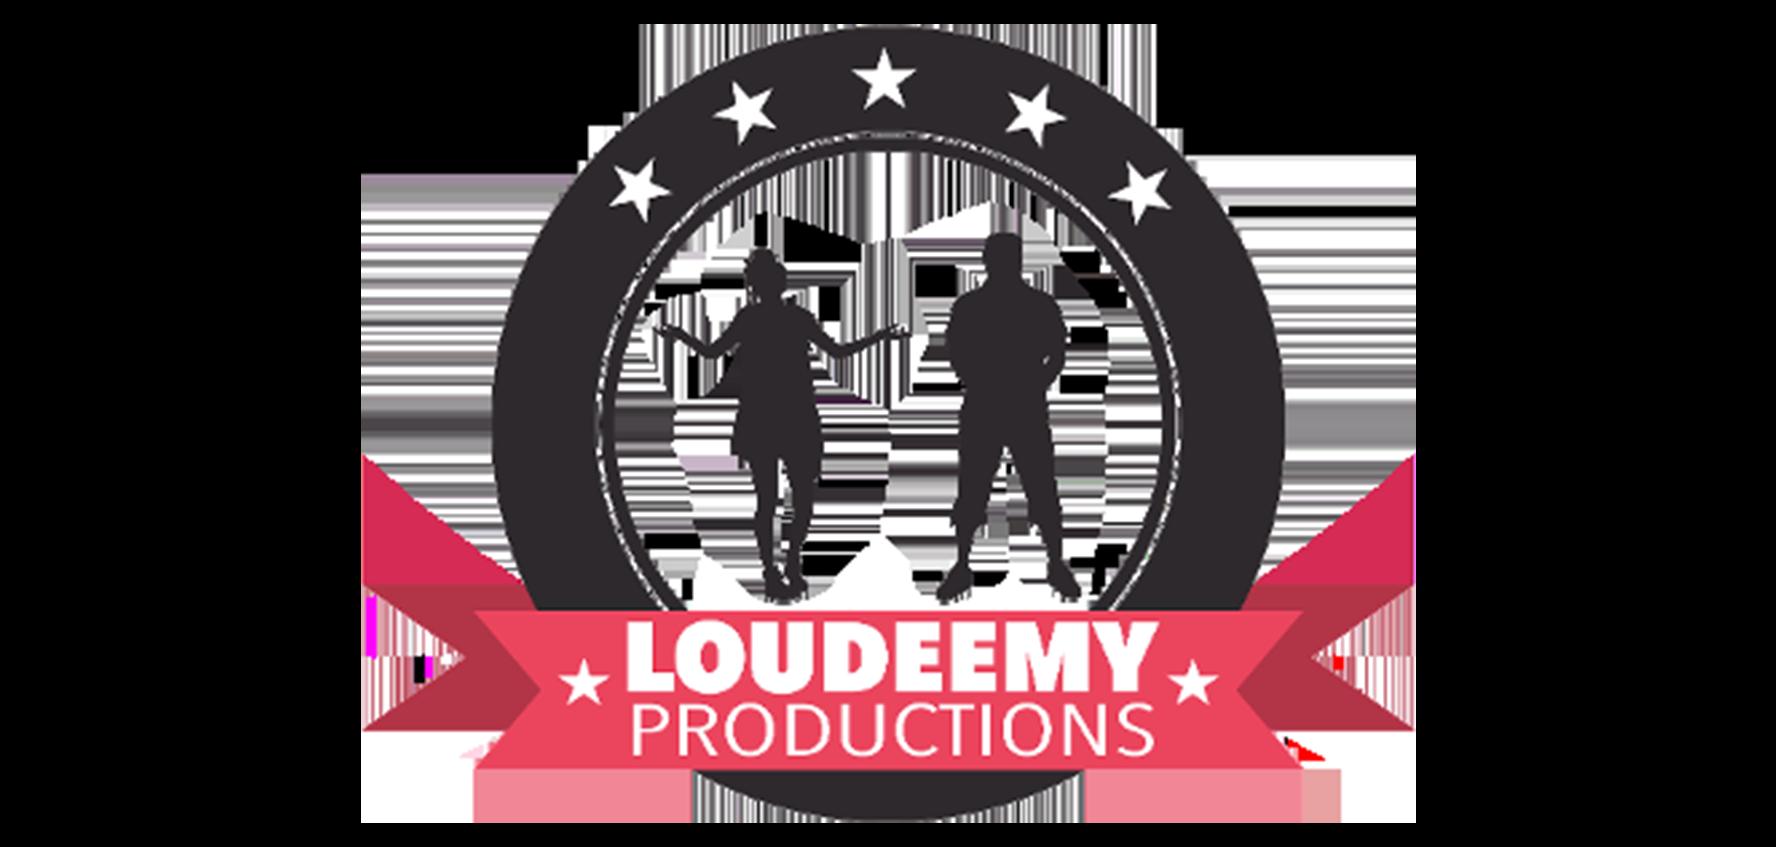 Loudeemy